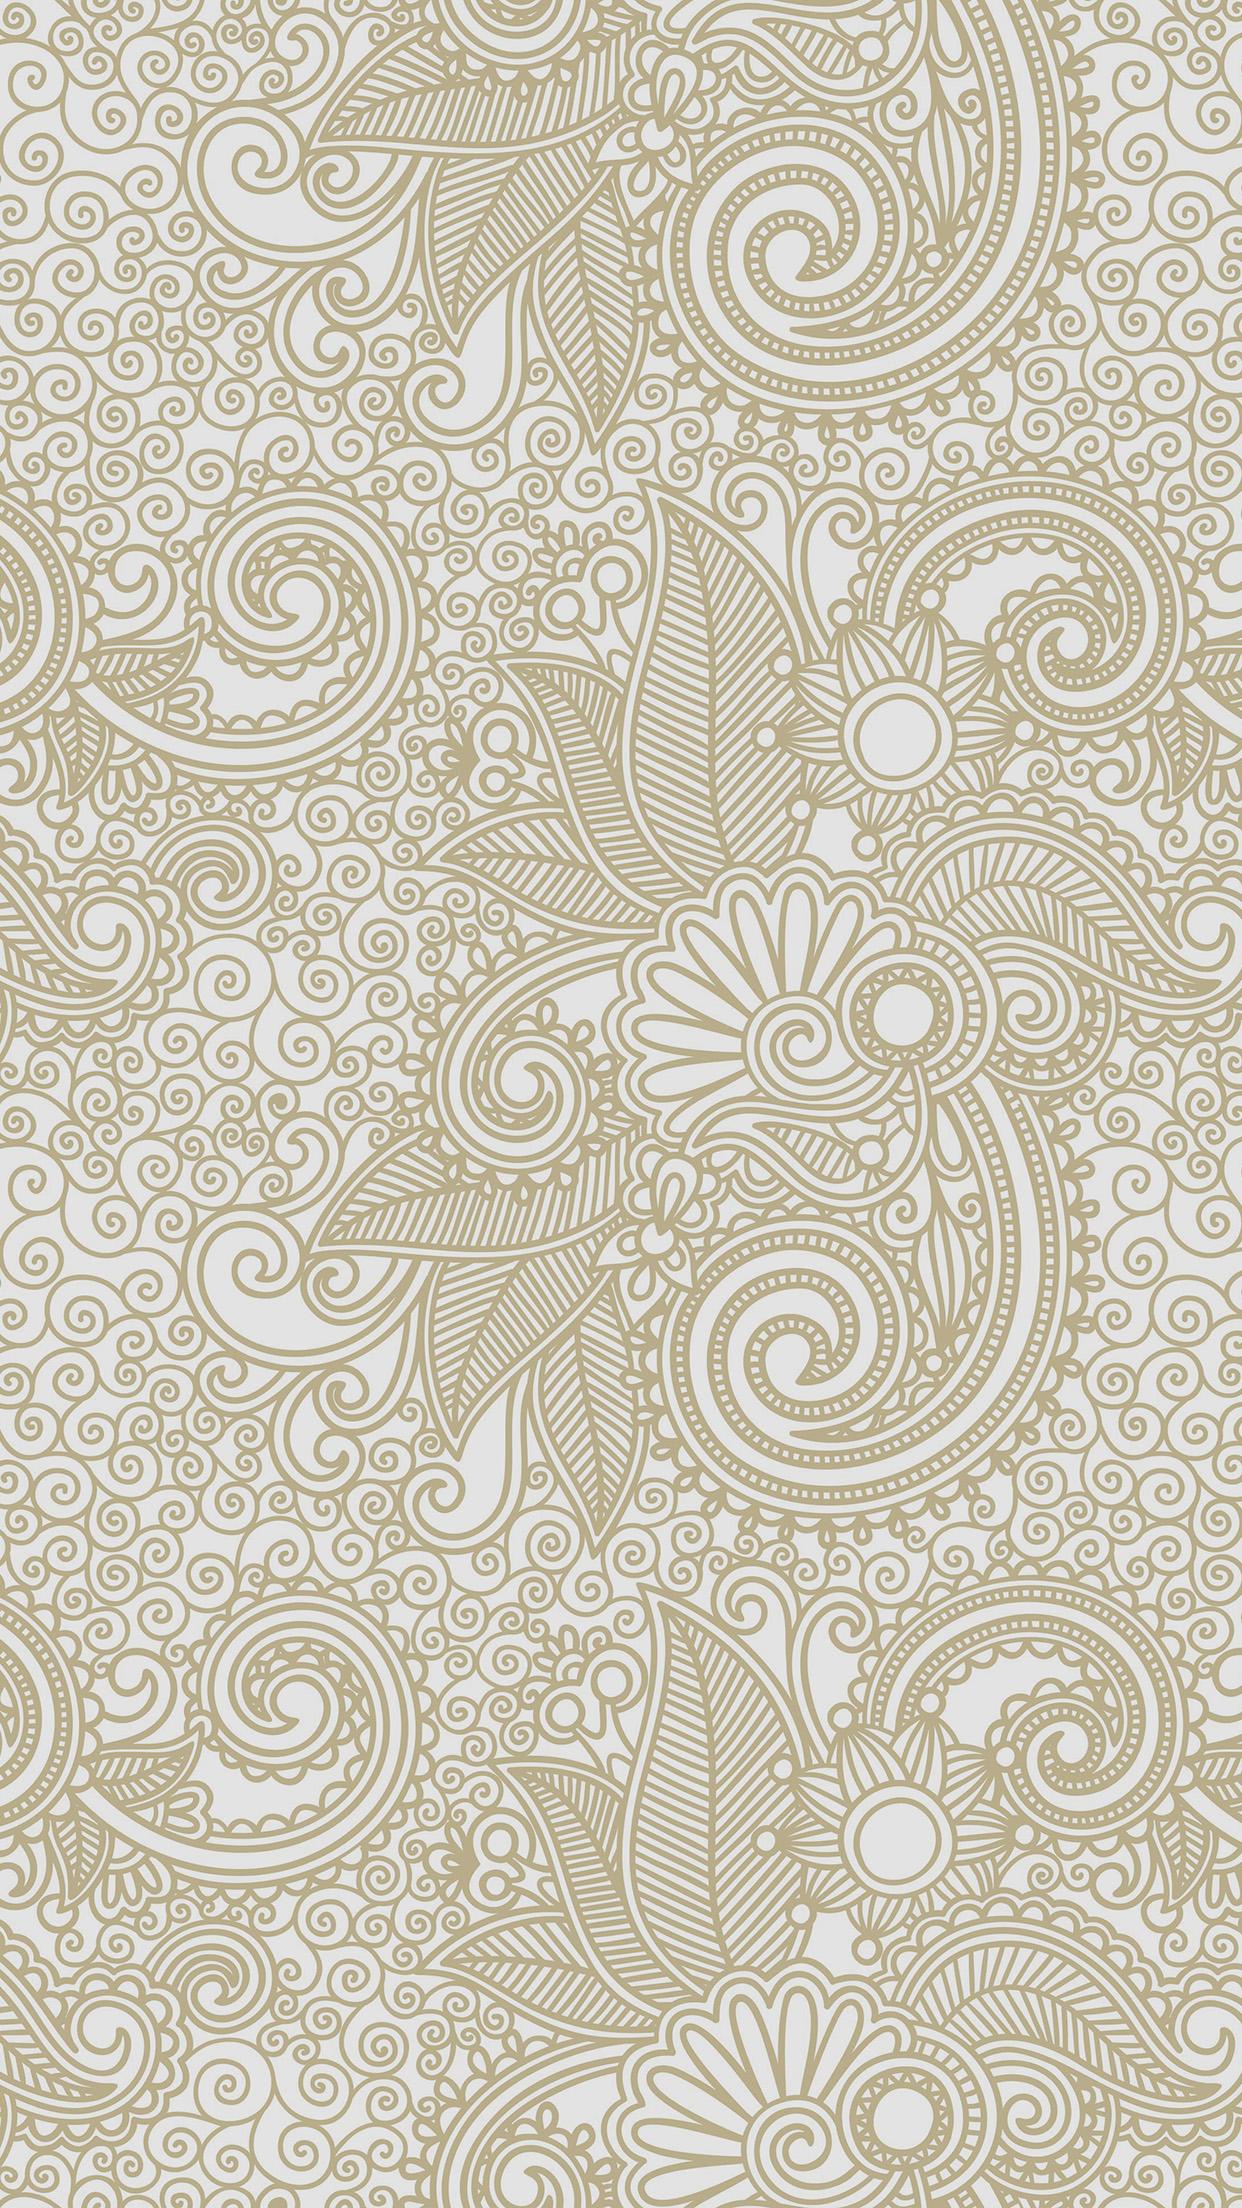 Iphone6papers Vk27 Wallpaper Design Flower Line Pattern